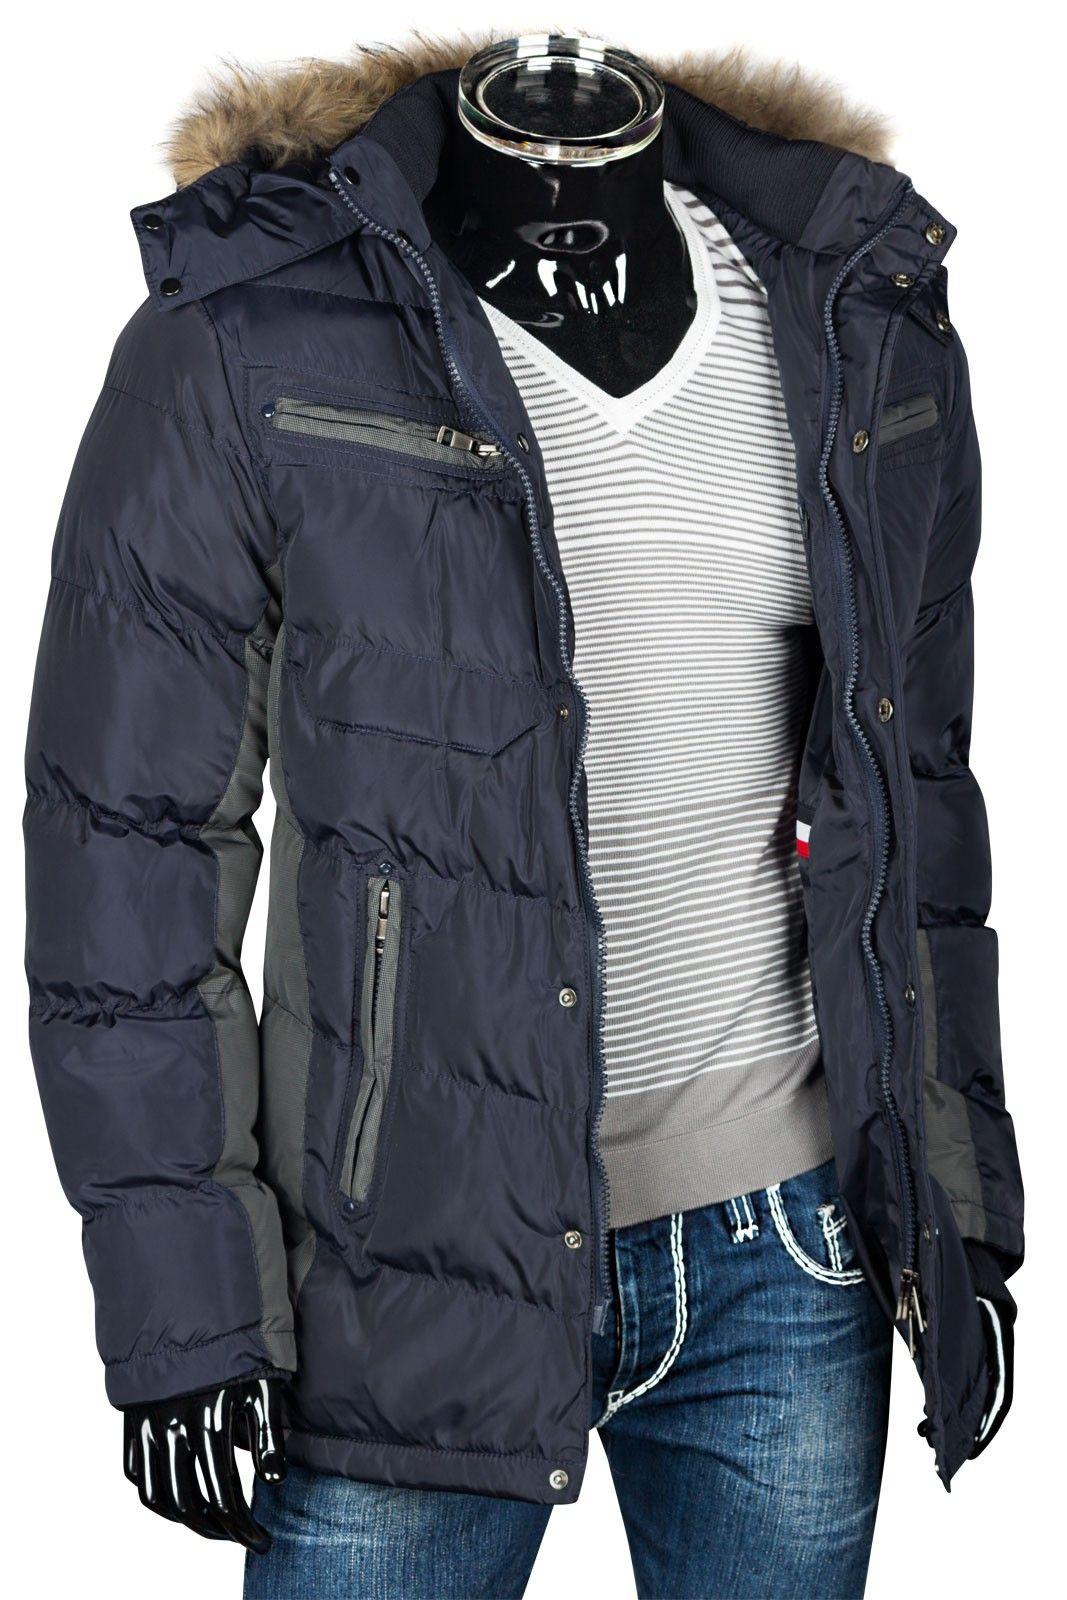 Herren Winterjacke Steppjacke Mit Fellkapuze Daunen Look Jacken Herren Mode Deinefashion Online Shop Die Neuesten Modetrends Trends 2015 Bekleidung Con Imagenes